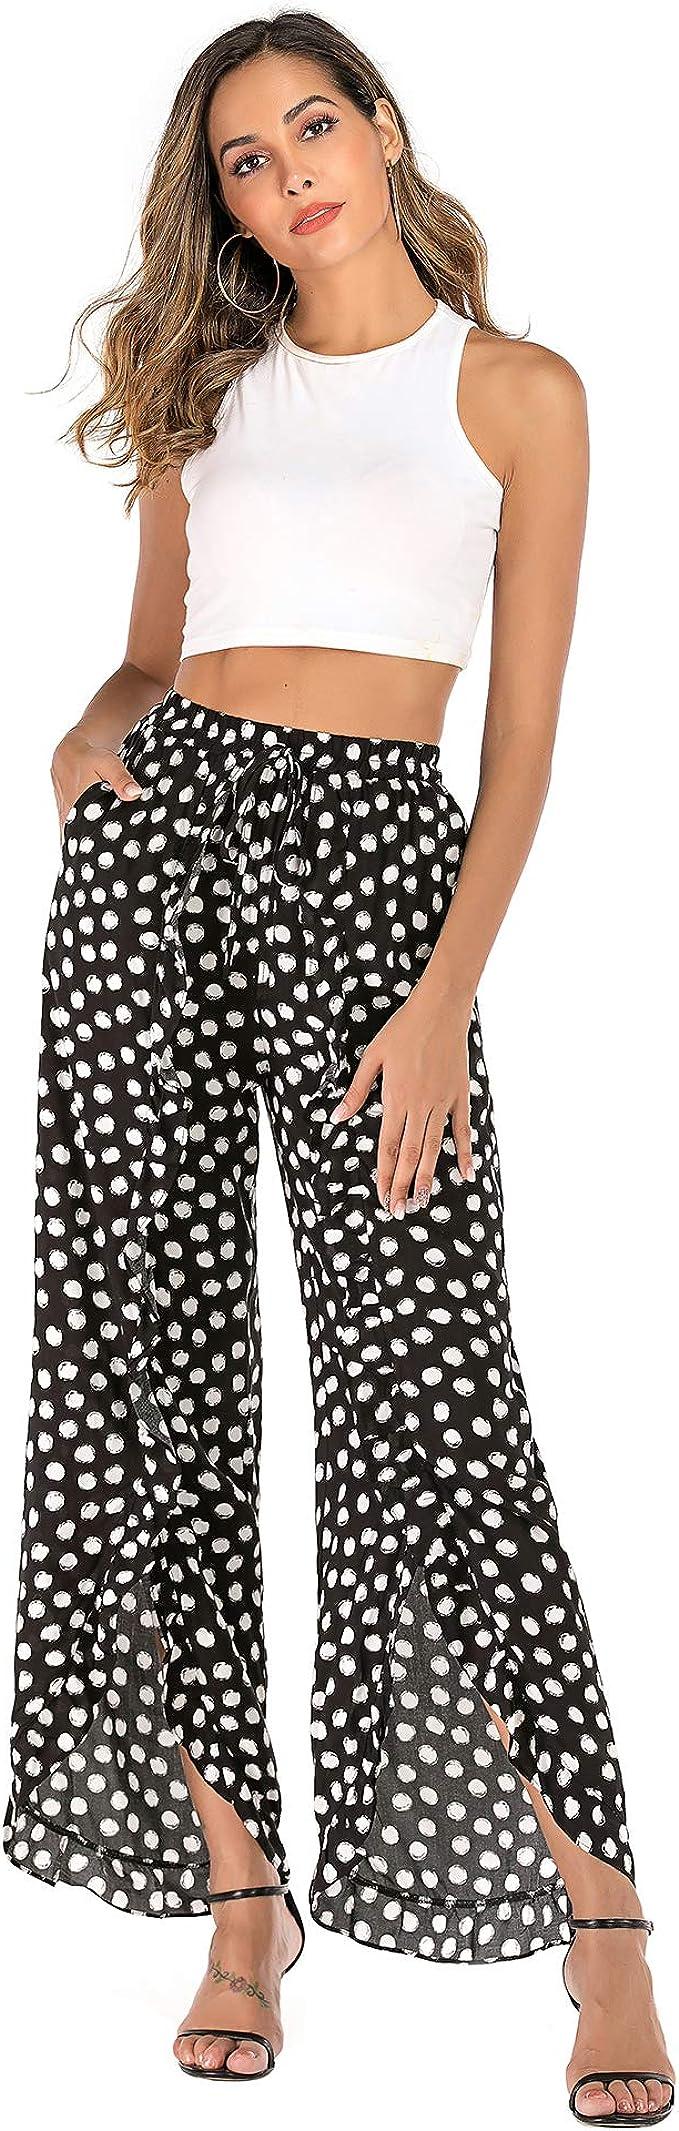 Women/' Pants Casual Loose Solid Lace Wide Leg Bottom Trousers Boho Hippie Lounge Palazzo High-Waist Pants